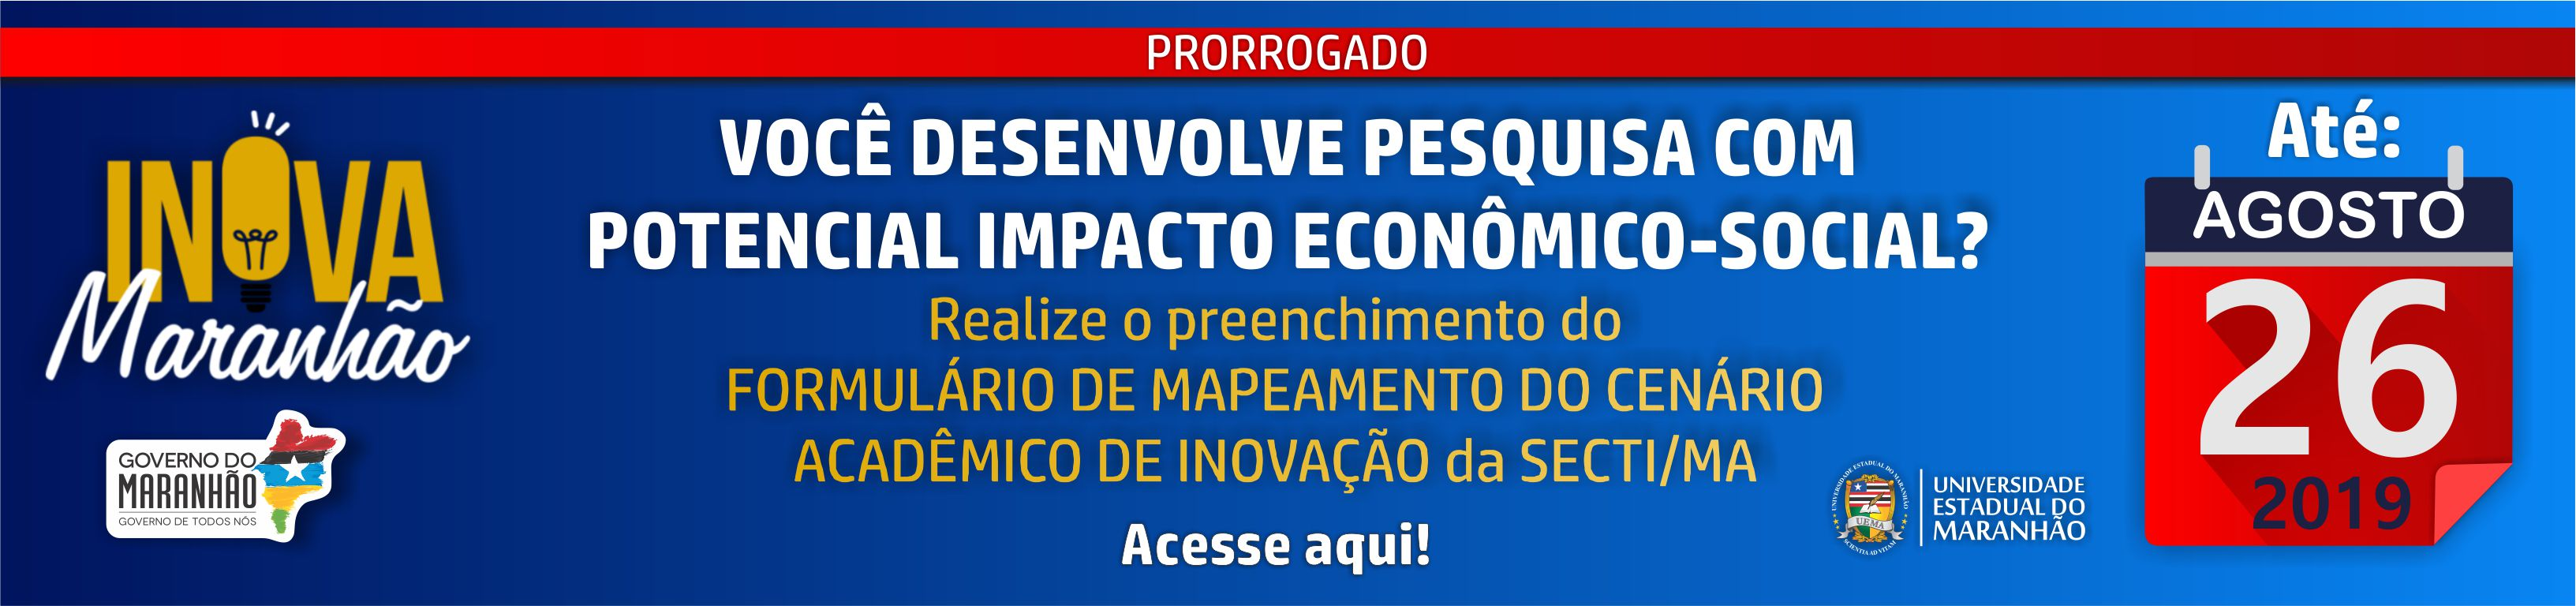 Banner_Inova_MA_prorrogacao